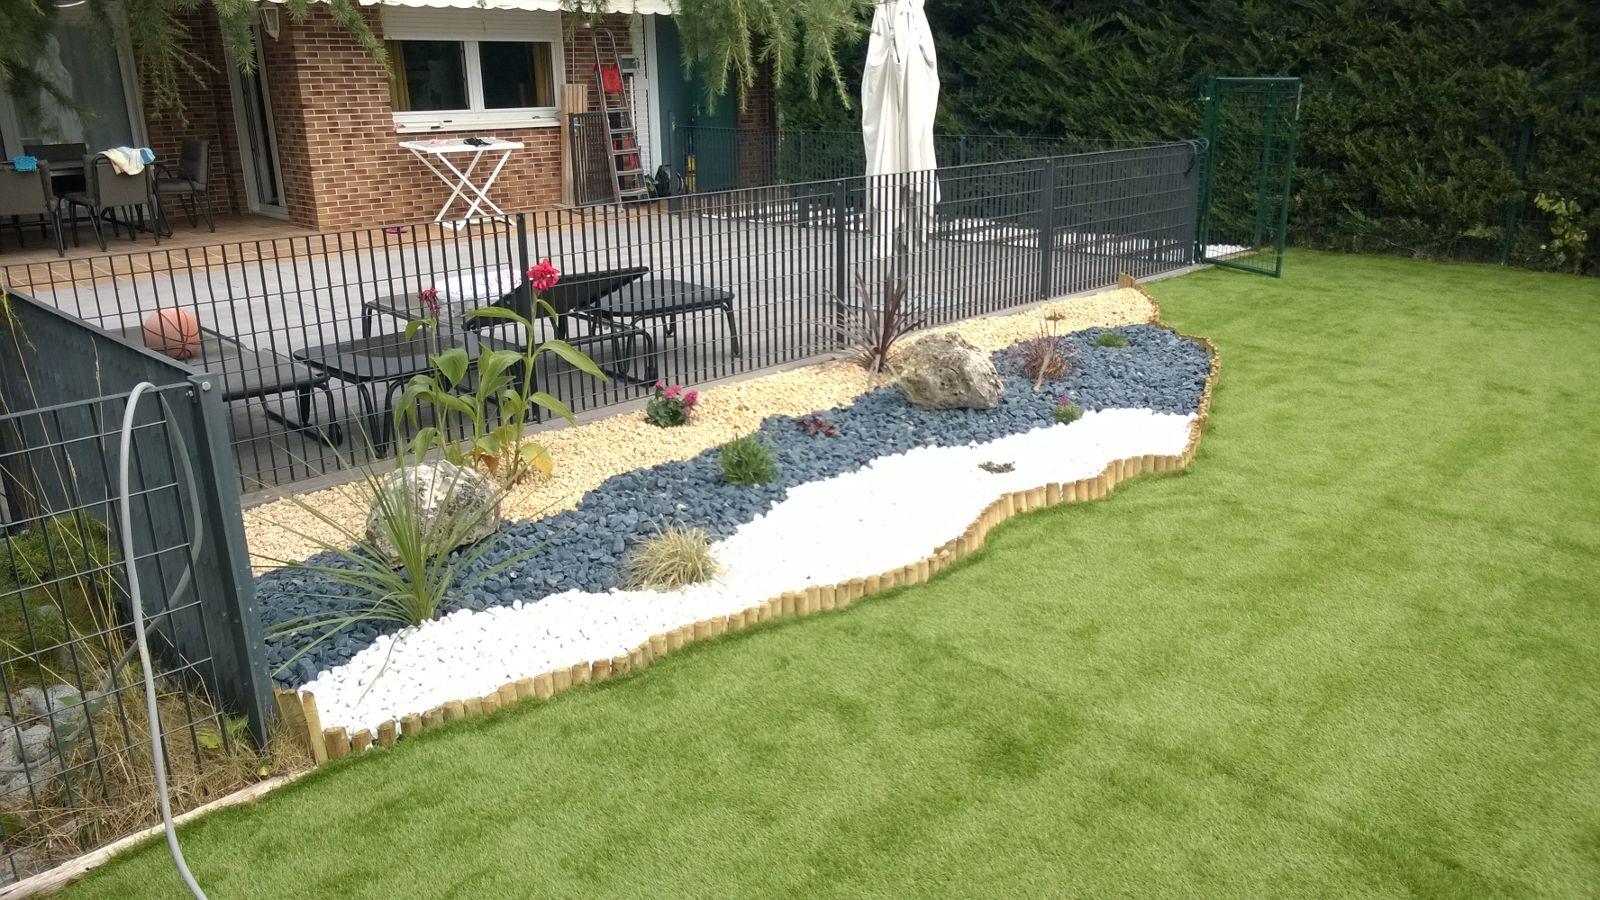 Pavimentos de jardin stunning diseo de jardn on consejos with pavimentos de jardin top - Pavimento jardin ...